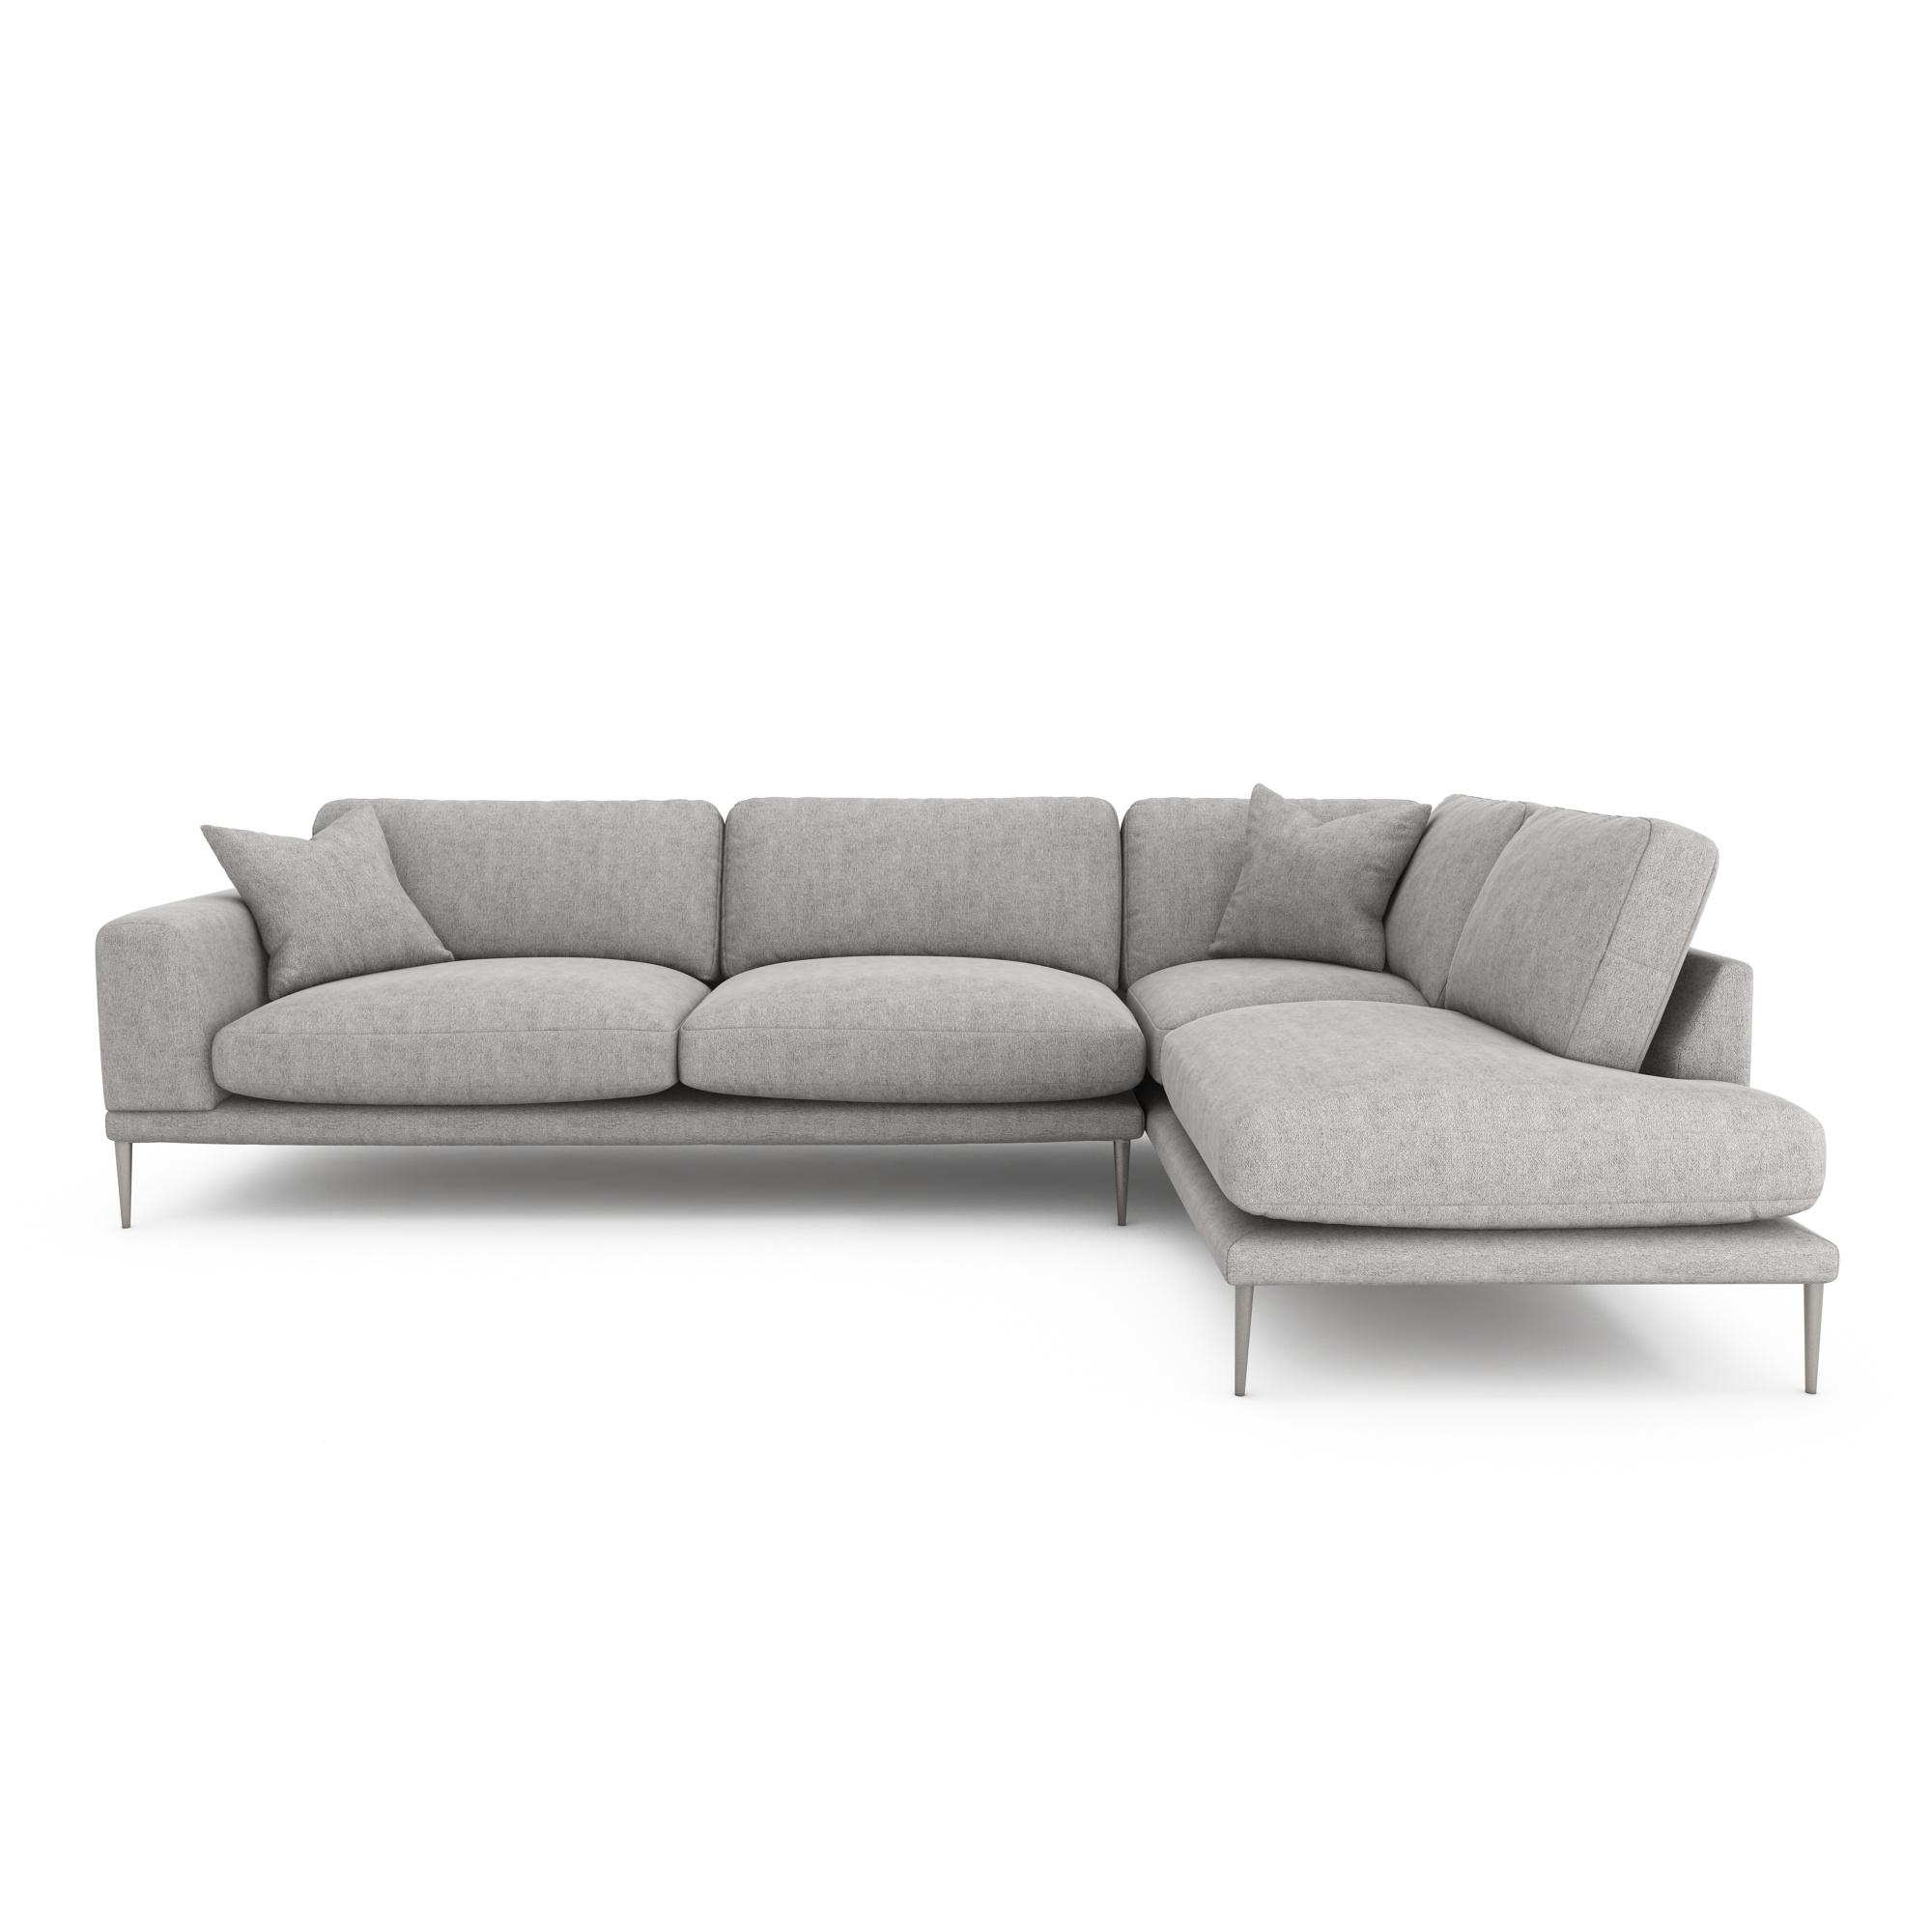 Bonito Fabric Corner Sofa